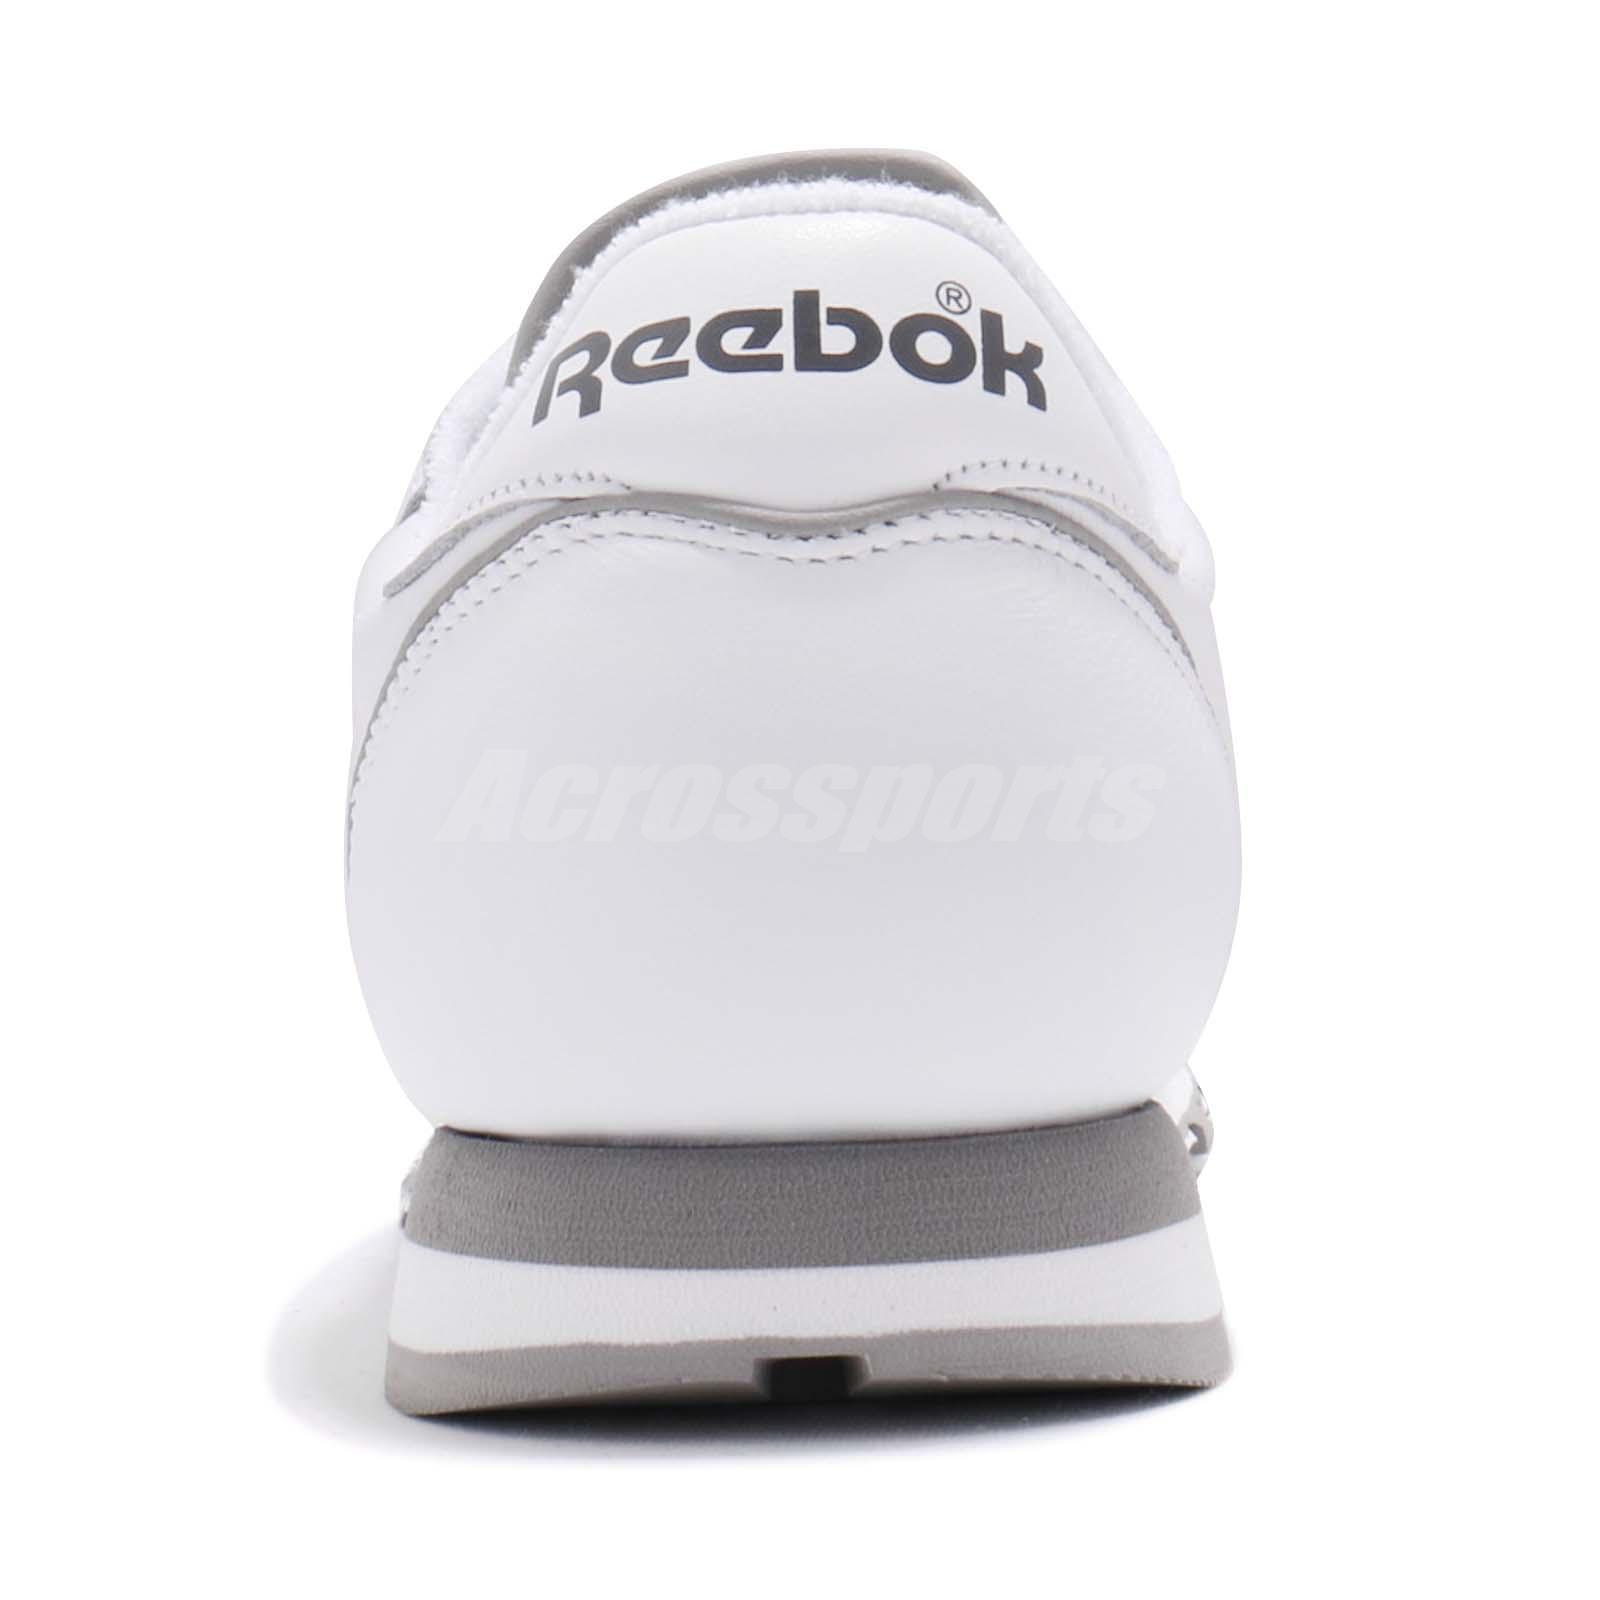 a987bb2b980 Reebok Classic CL Leather Archive White Carbon Grey Men Shoes ...